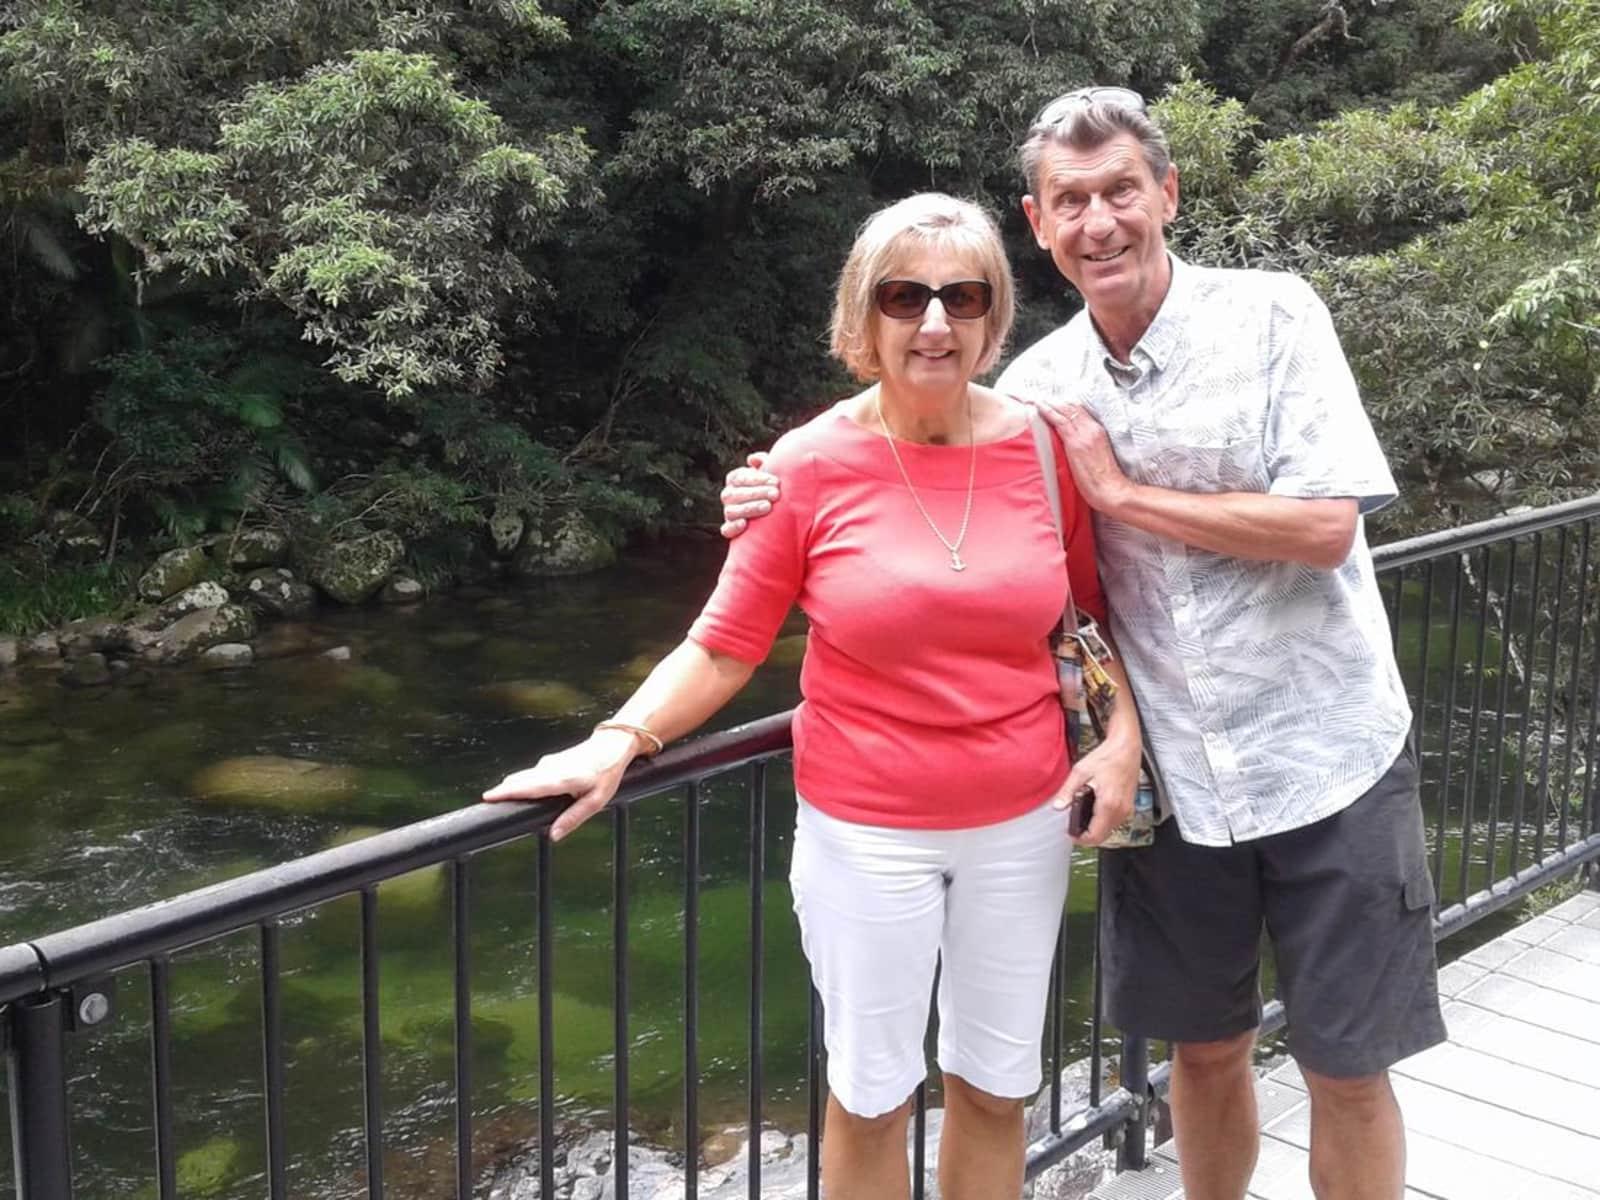 Ian & Heather from Brisbane, Queensland, Australia